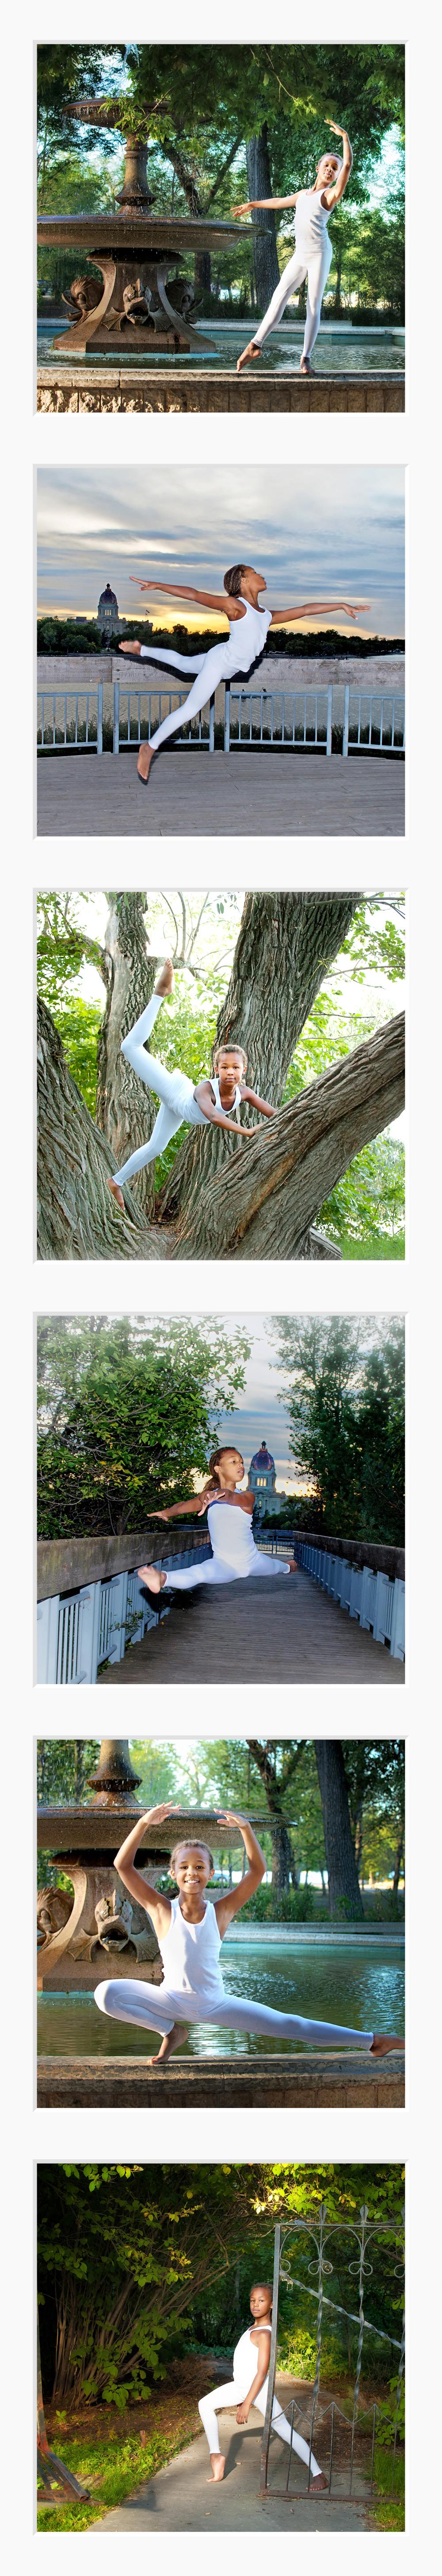 ballet-dancer-free-lense-photo-regina.jpg